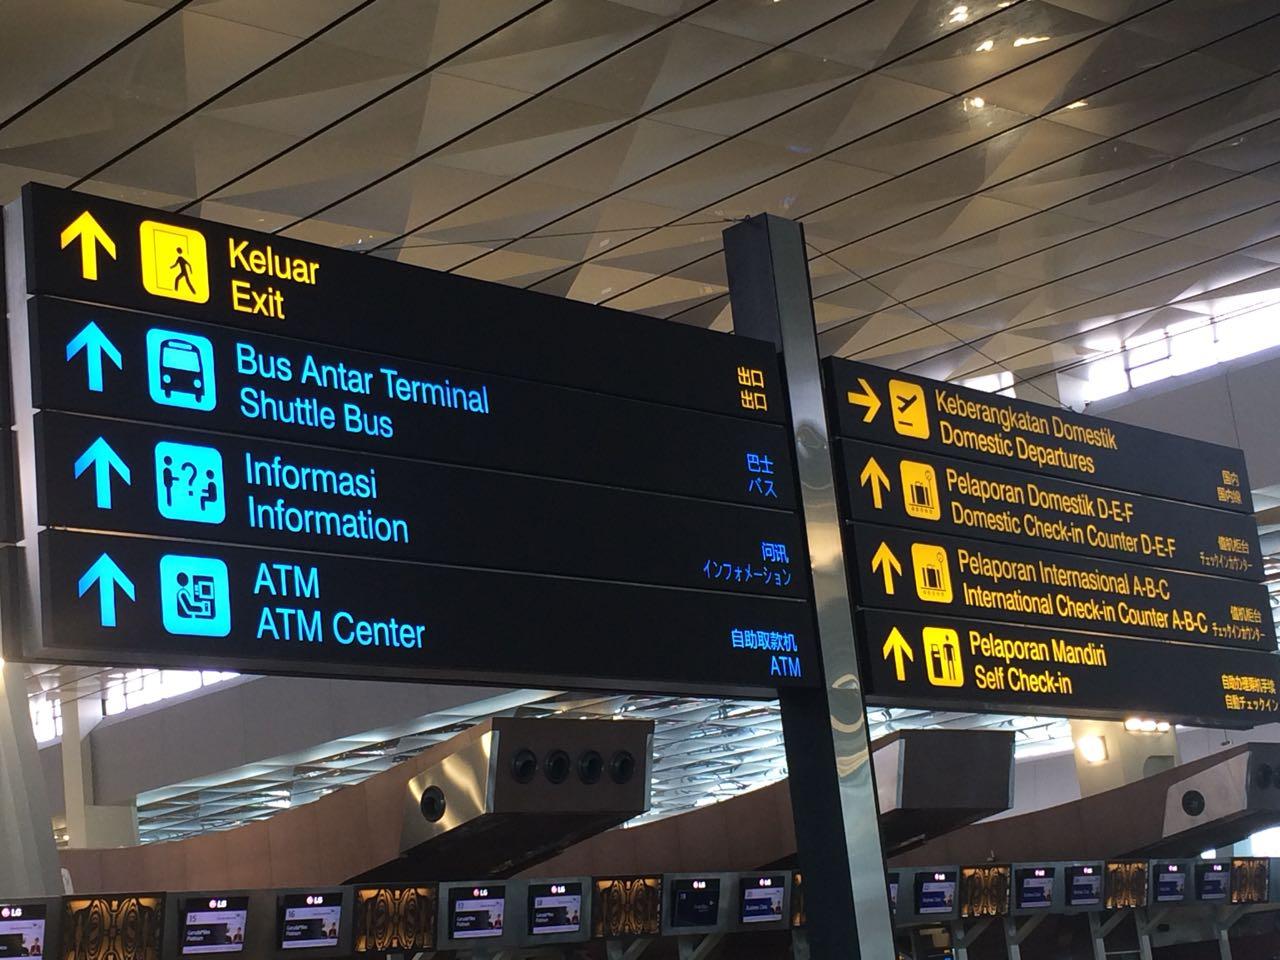 https: img-z.okeinfo.net content 2018 12 31 406 1998400 kejutan-seru-untuk-penumpang-rayakan-malam-tahun-baru-di-bandara-soekarno-hatta-G0g1QGrMlL.jpg